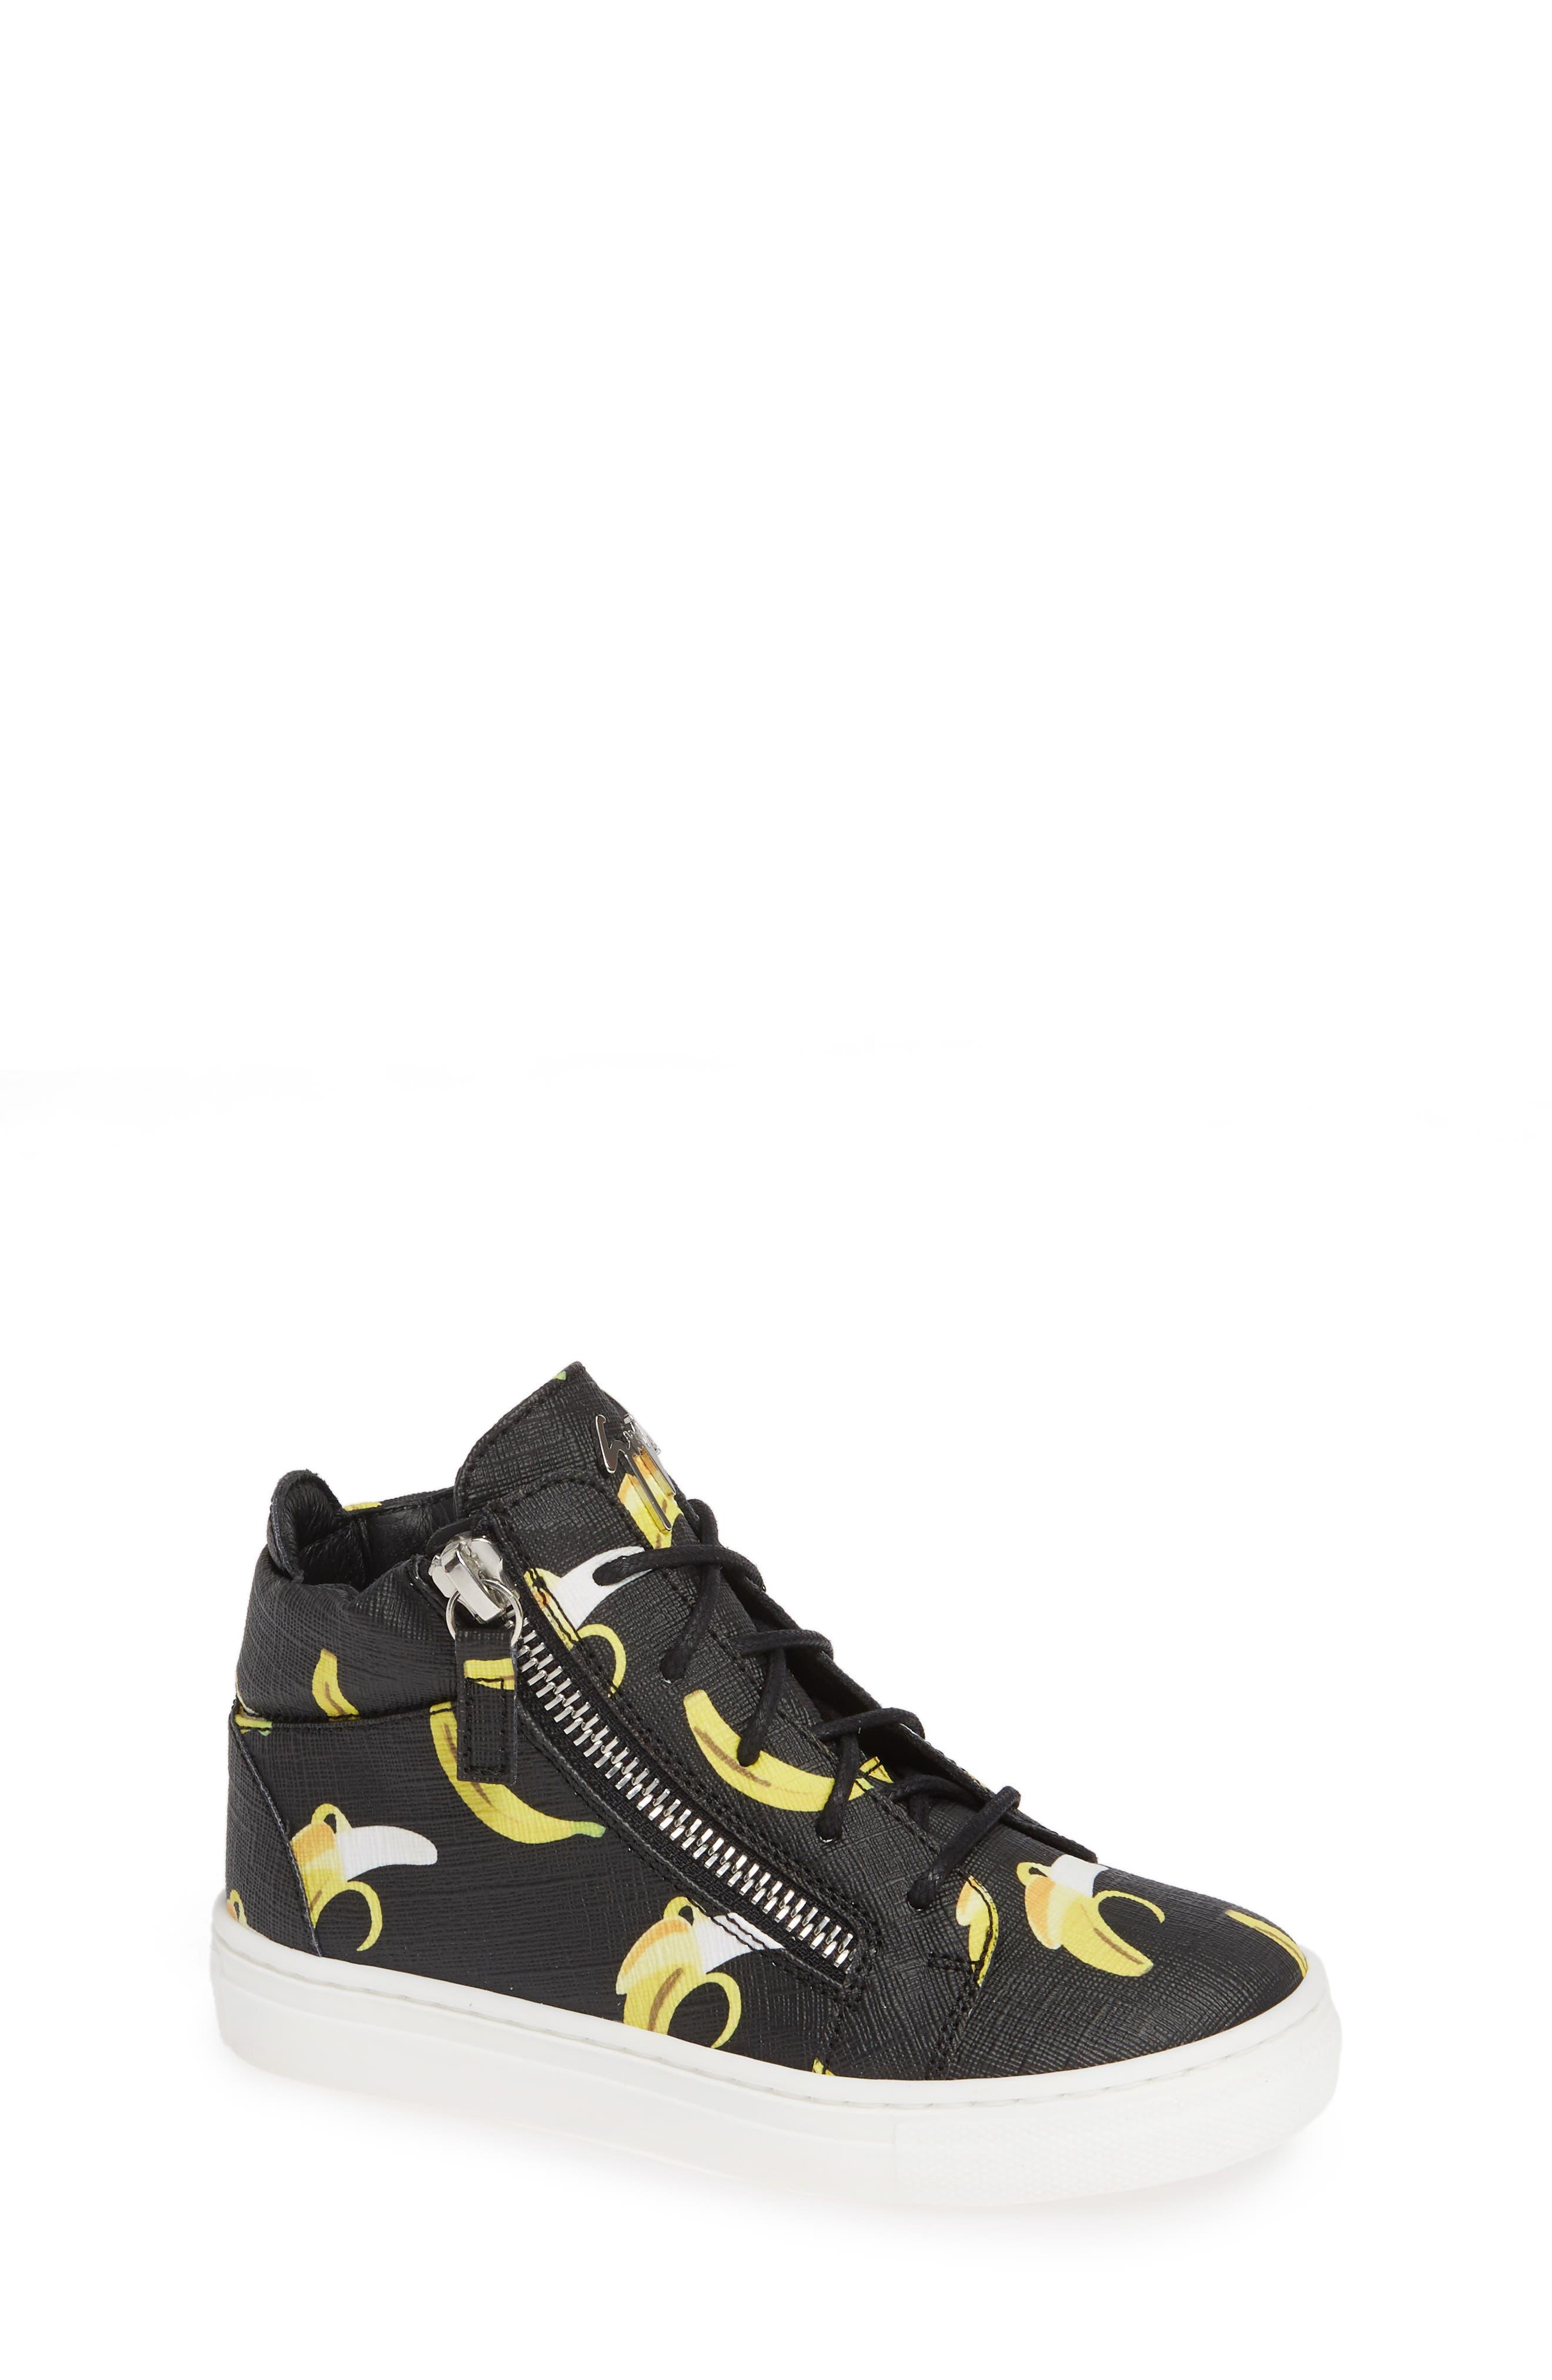 GIUSEPPE ZANOTTI Kidlondon Banana Print Sneaker, Main, color, BANANAS